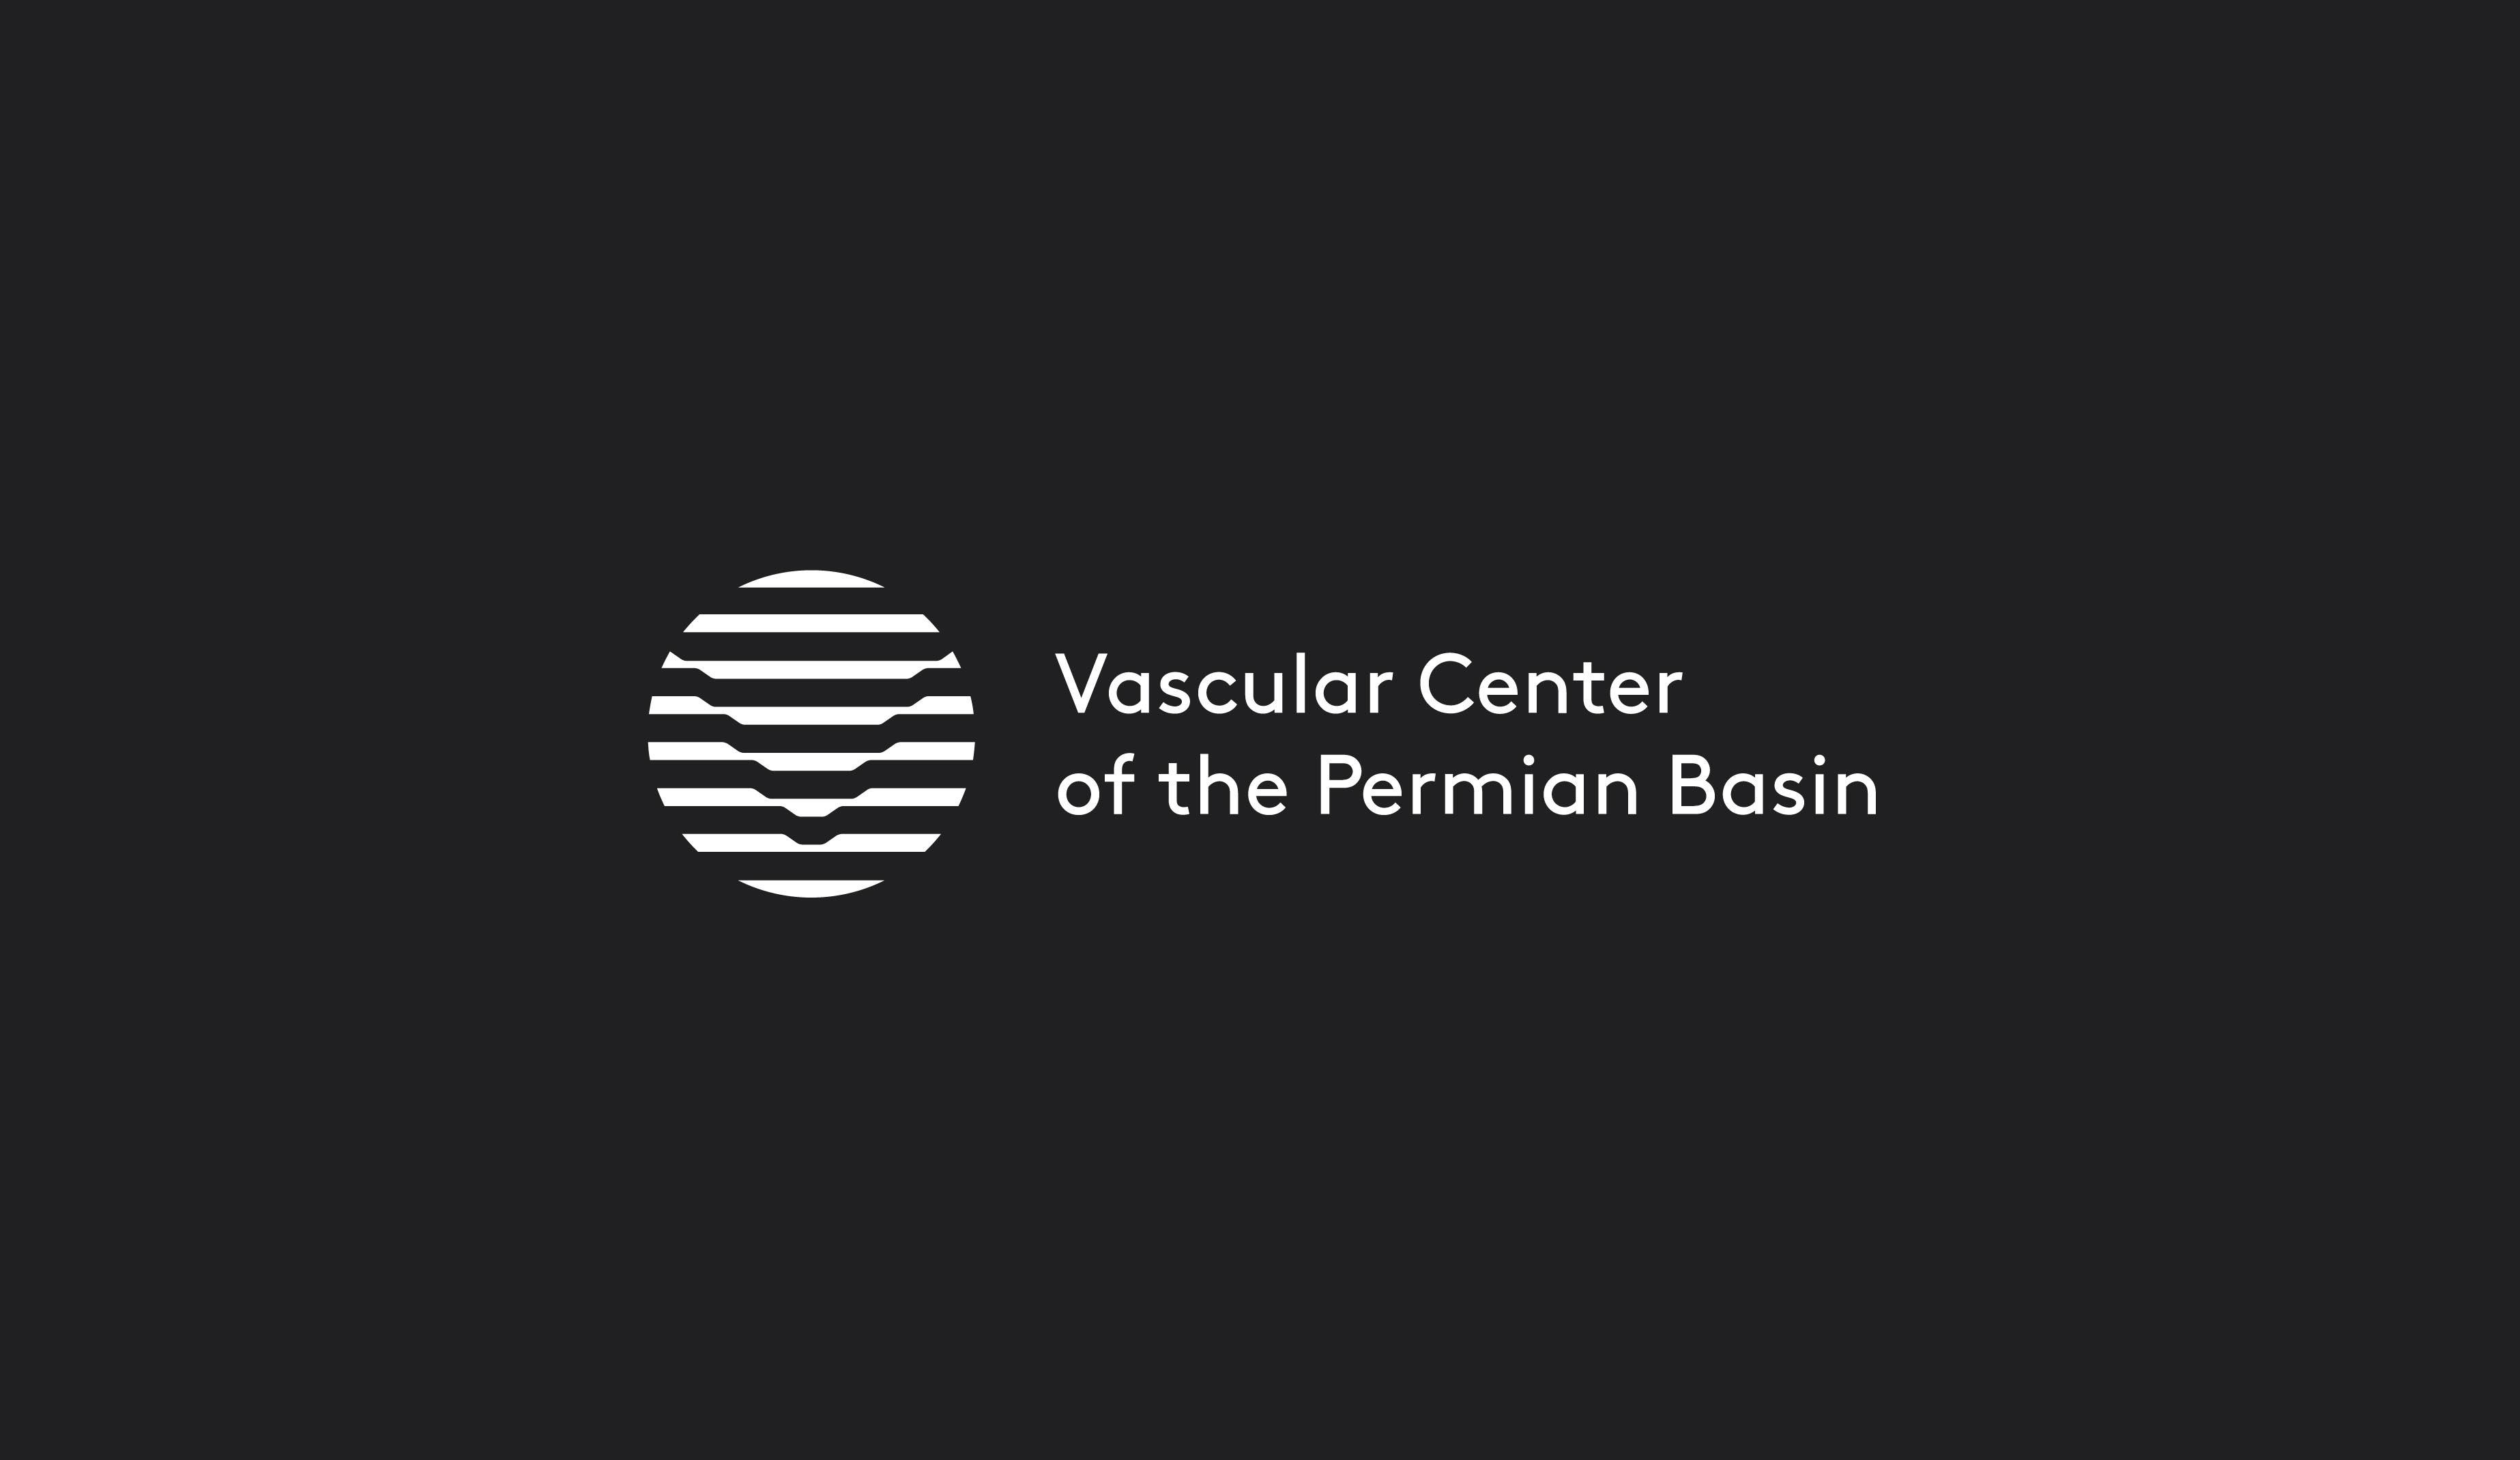 Vascular Center of the Permian Basin logo design